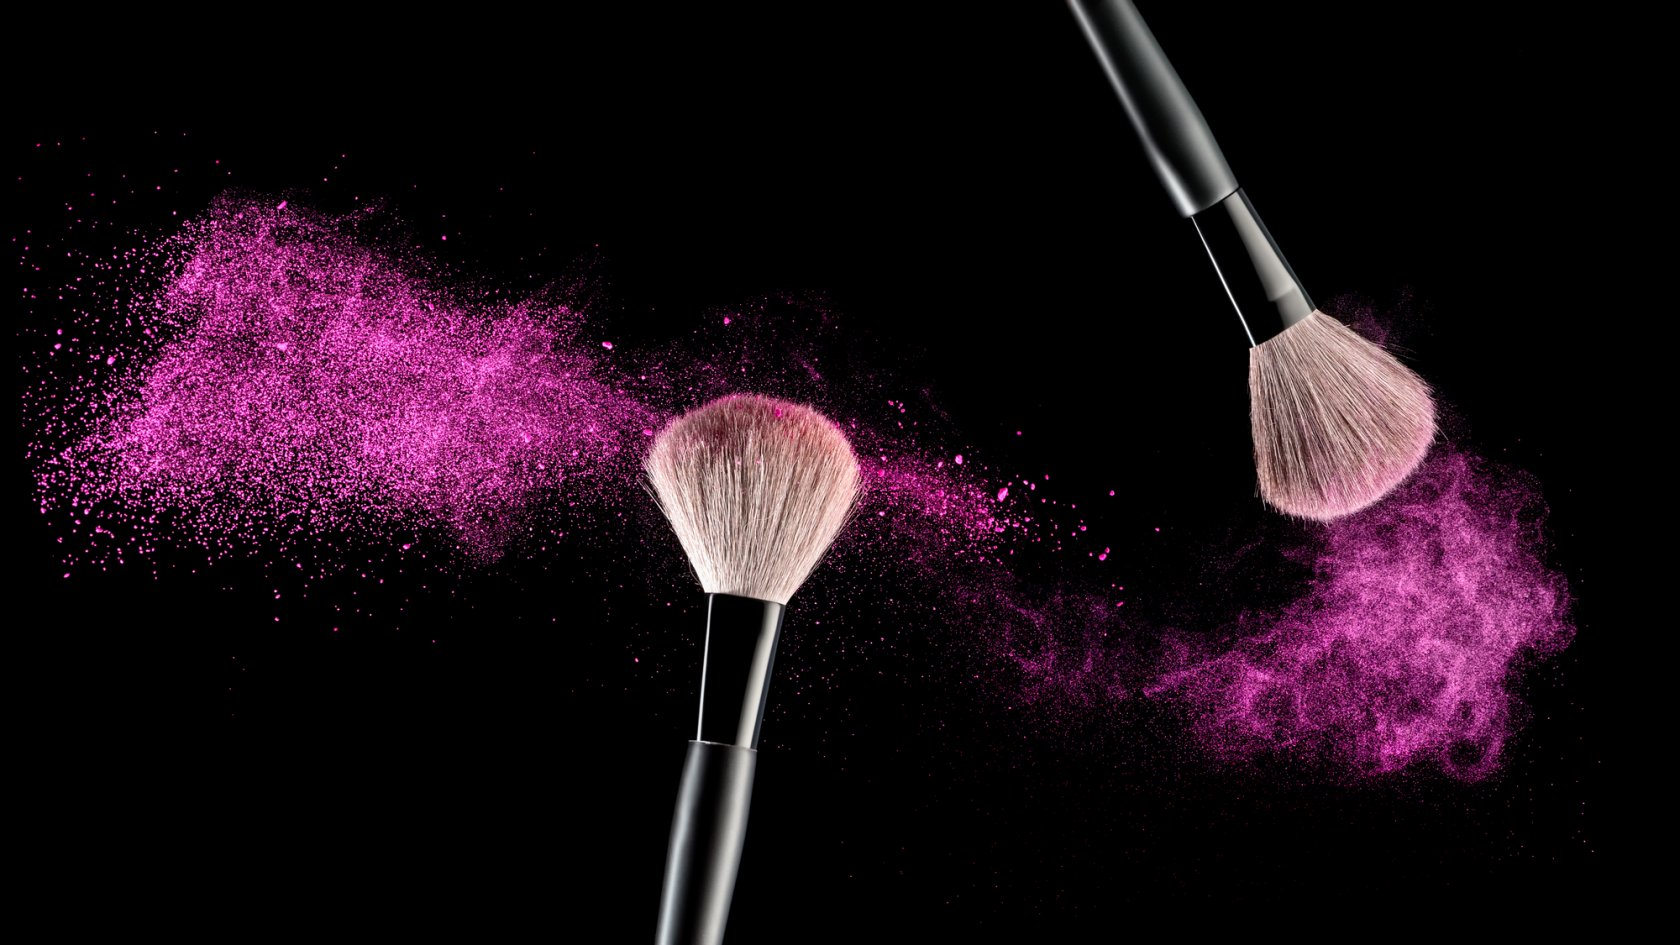 Кисти для макияжа на черном фоне